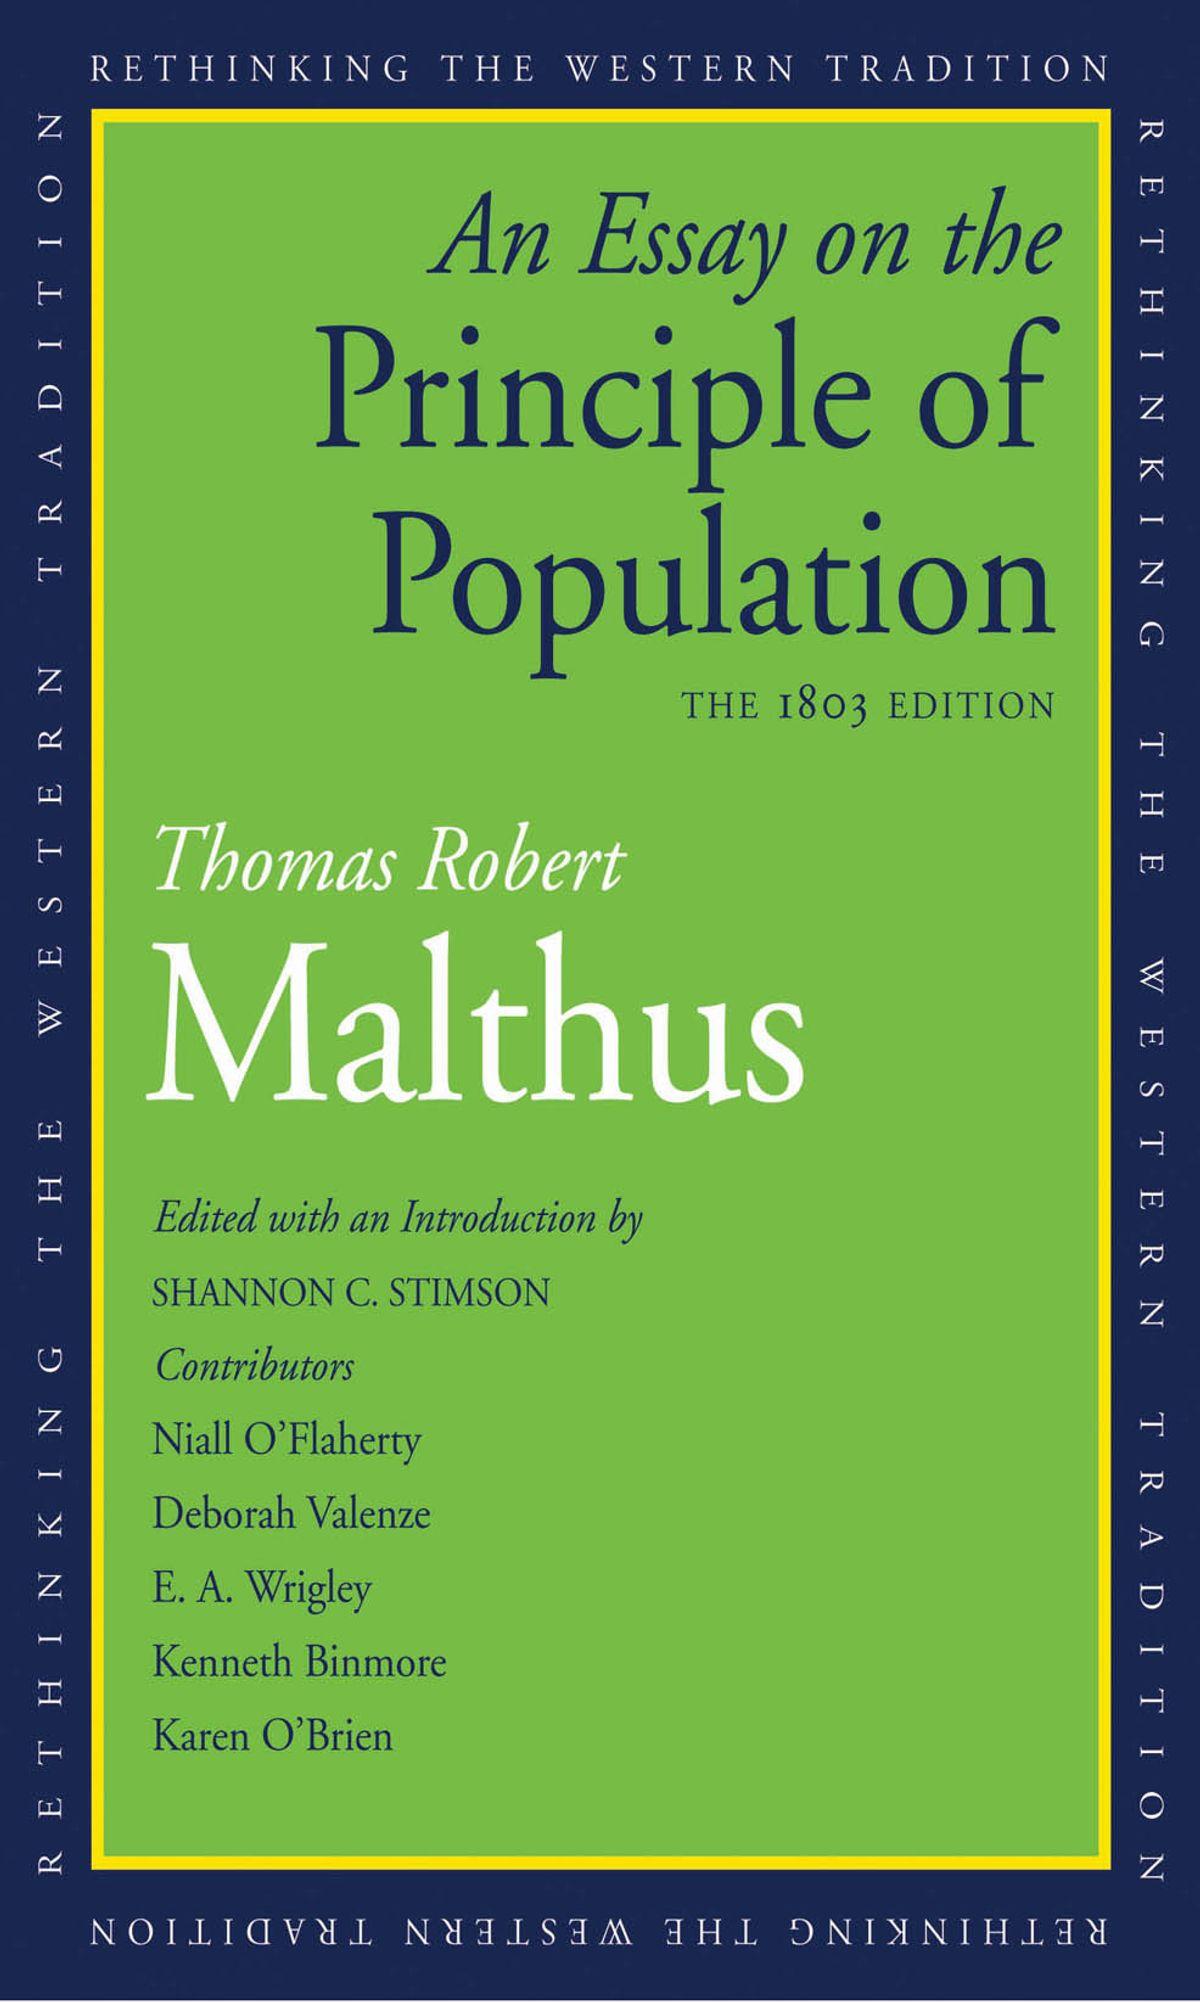 003 Essay On The Principle Of Population Example An Singular Pdf By Thomas Malthus Main Idea Full